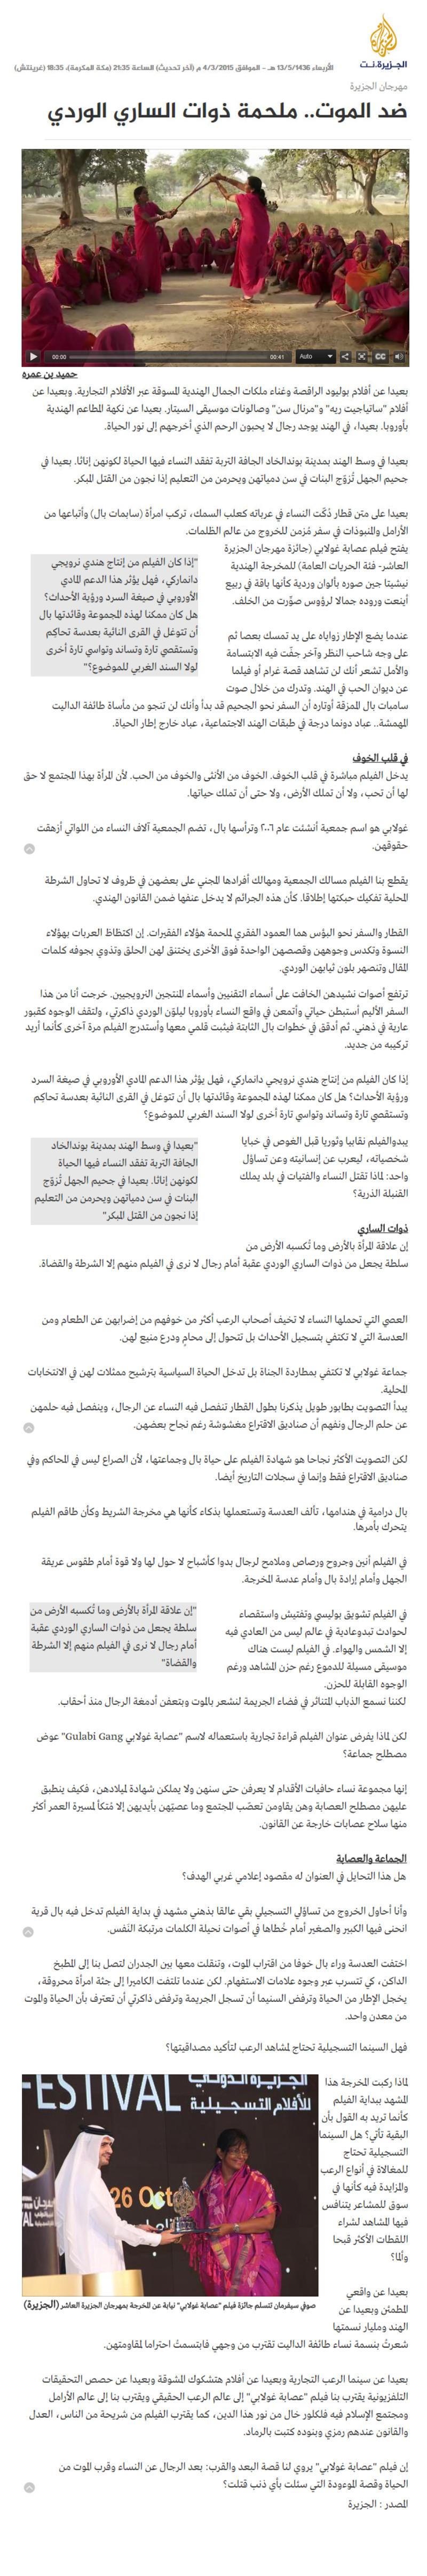 paper film critics aljazeera hamid benamra